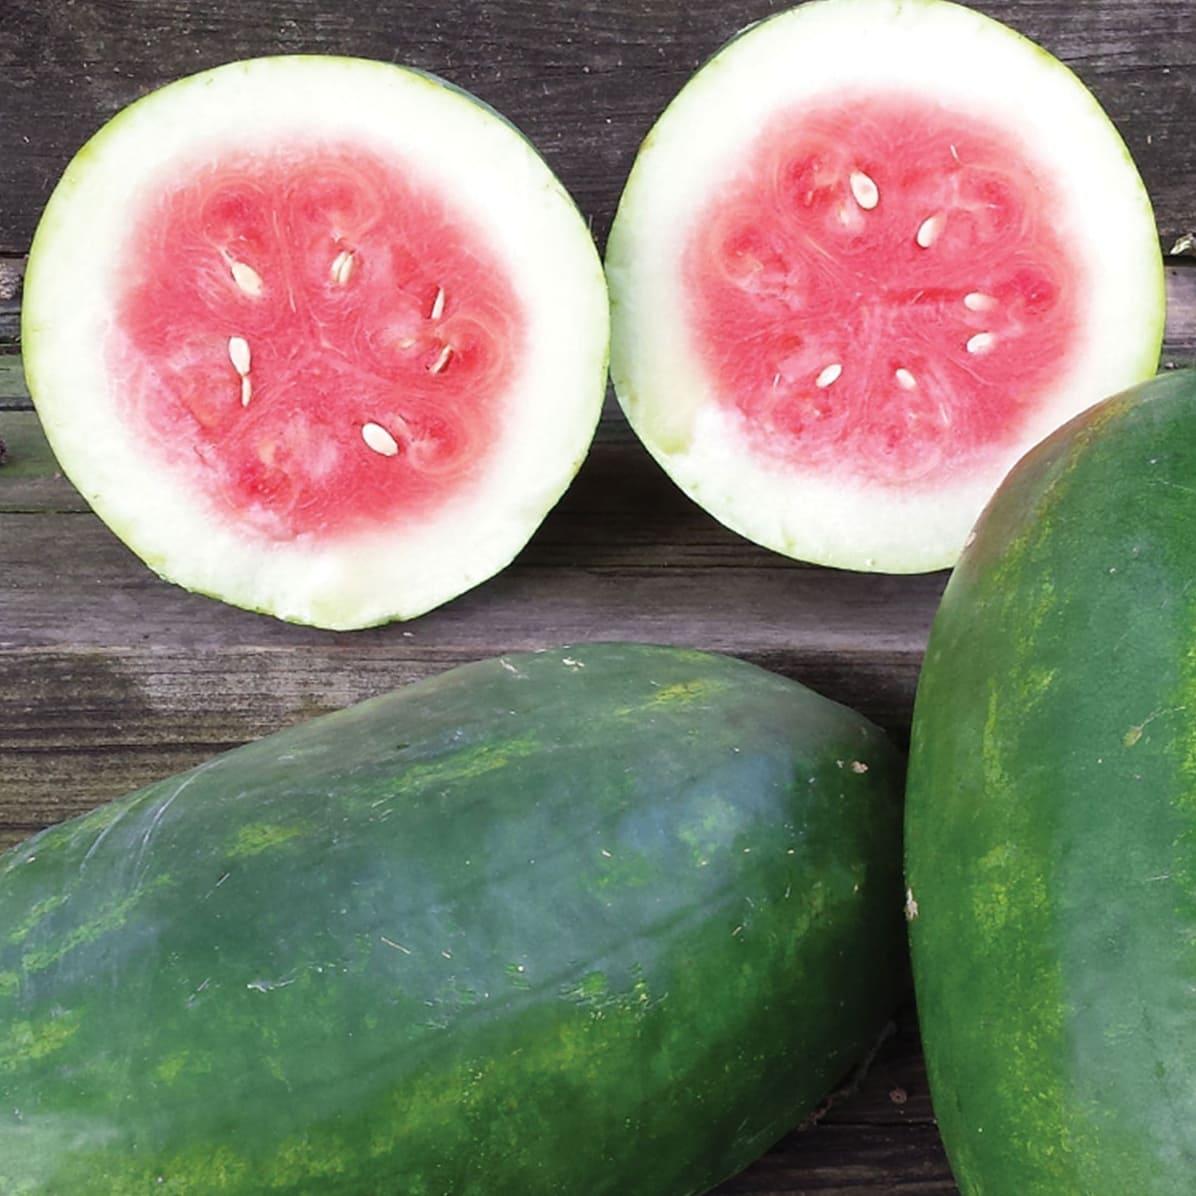 Photo of watermelon